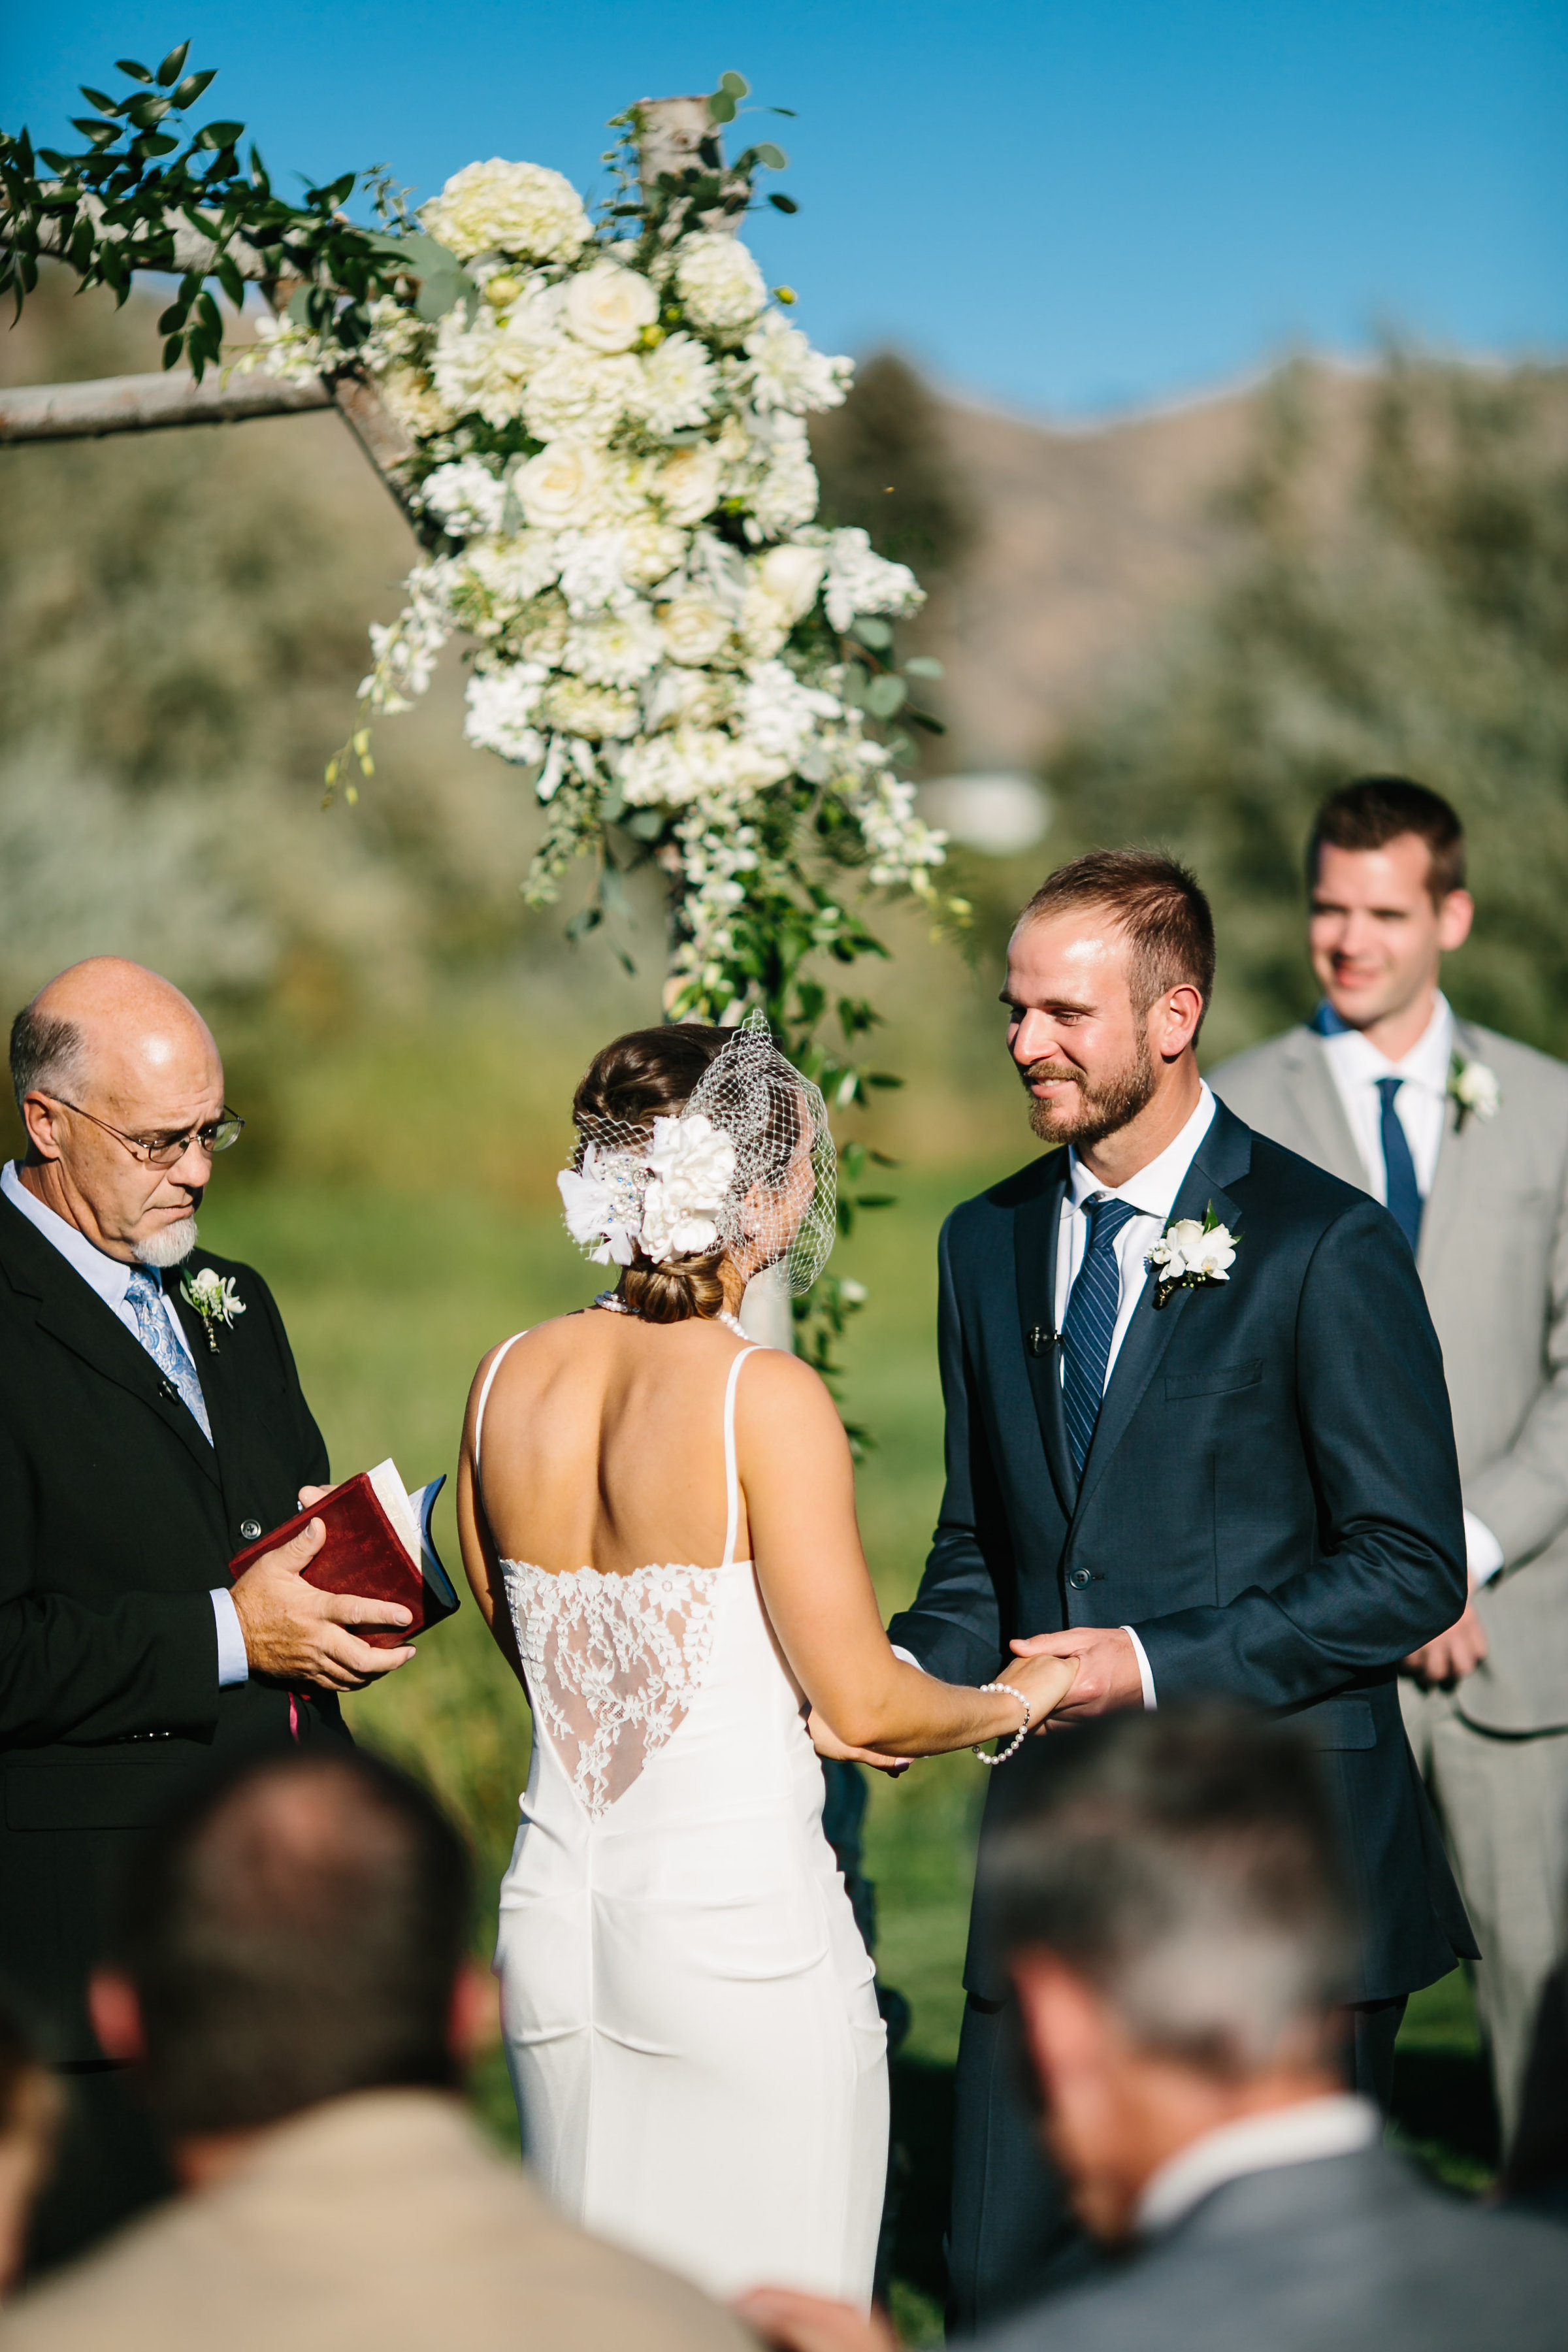 janet_greg_wedding-683.jpg